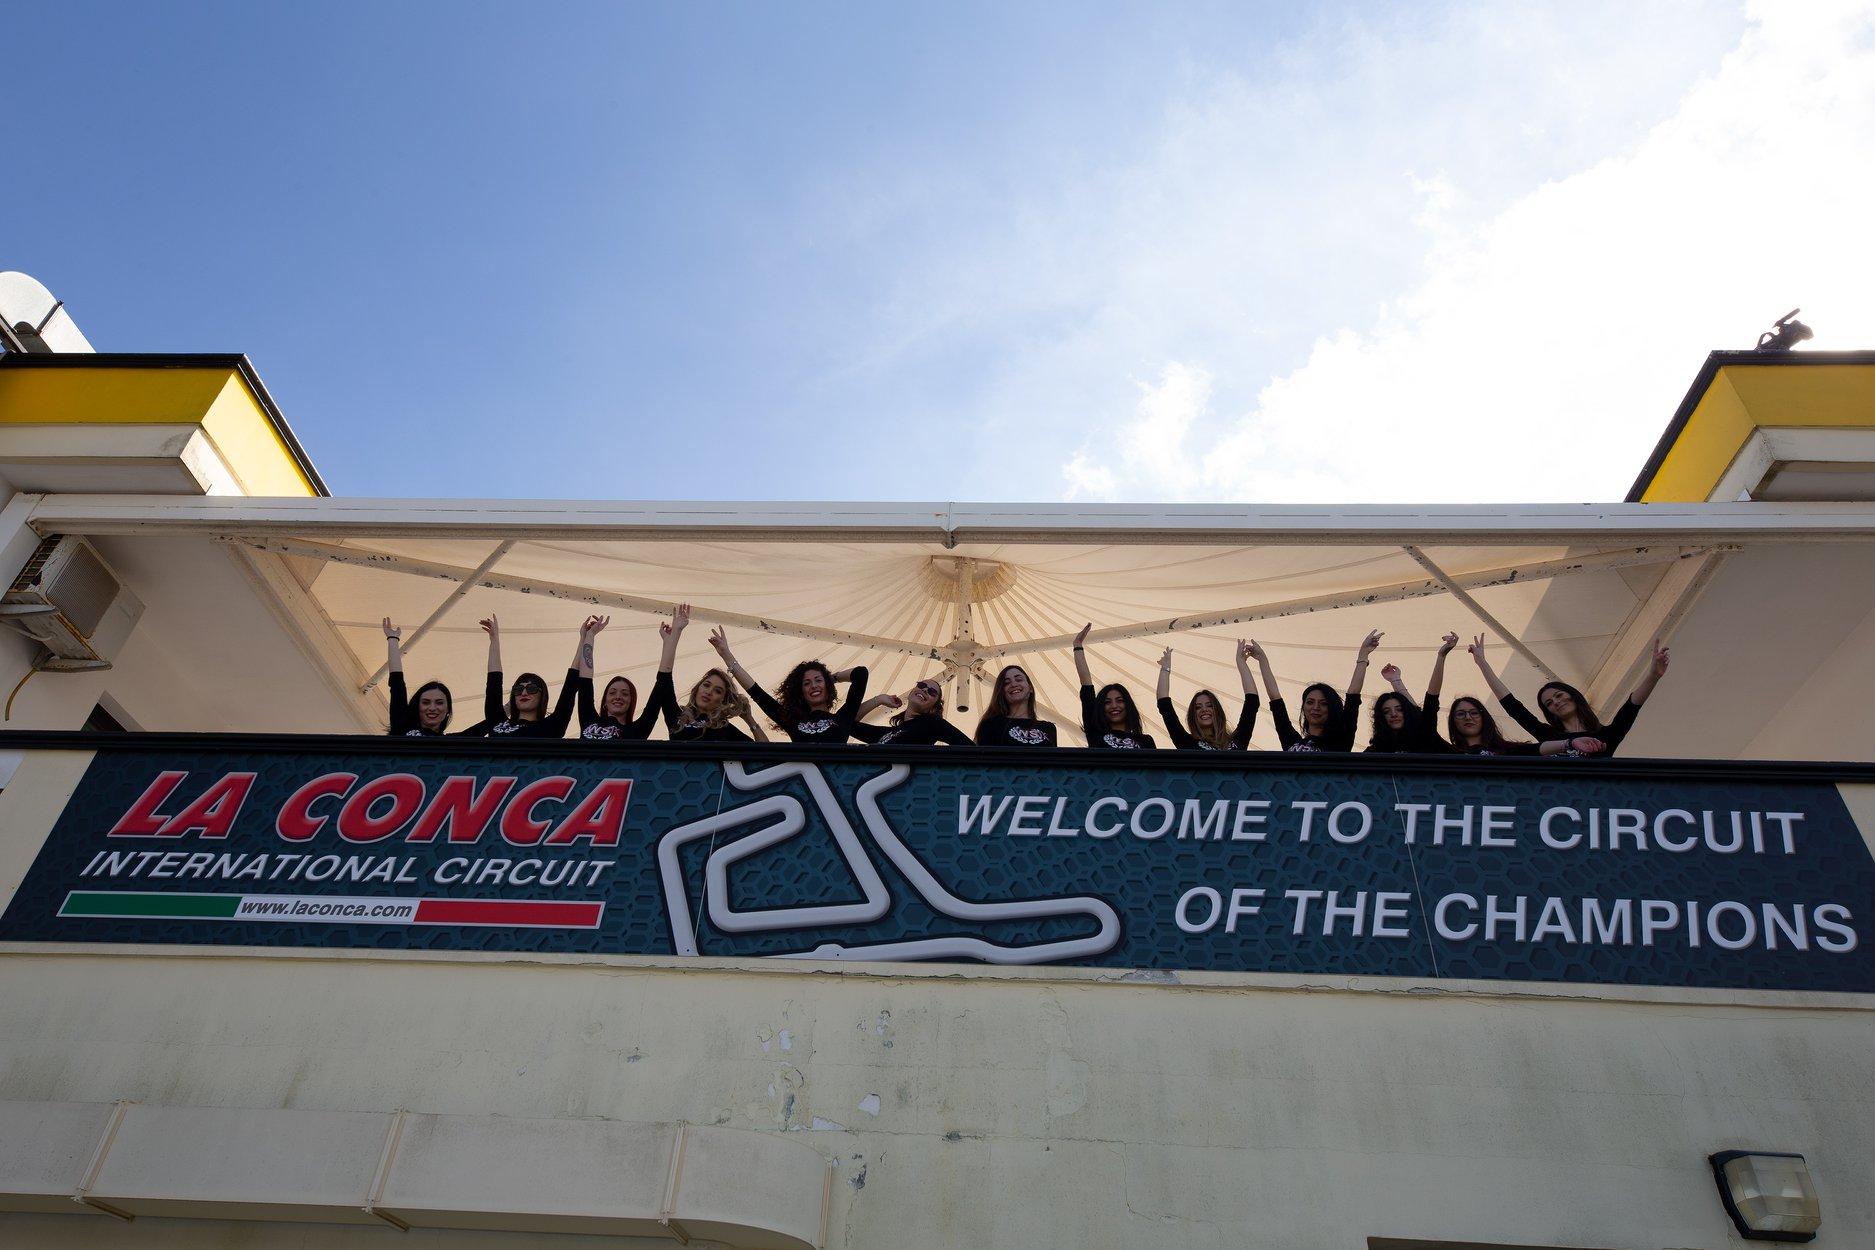 WSK Super Master Series, La Conca appointment postponed